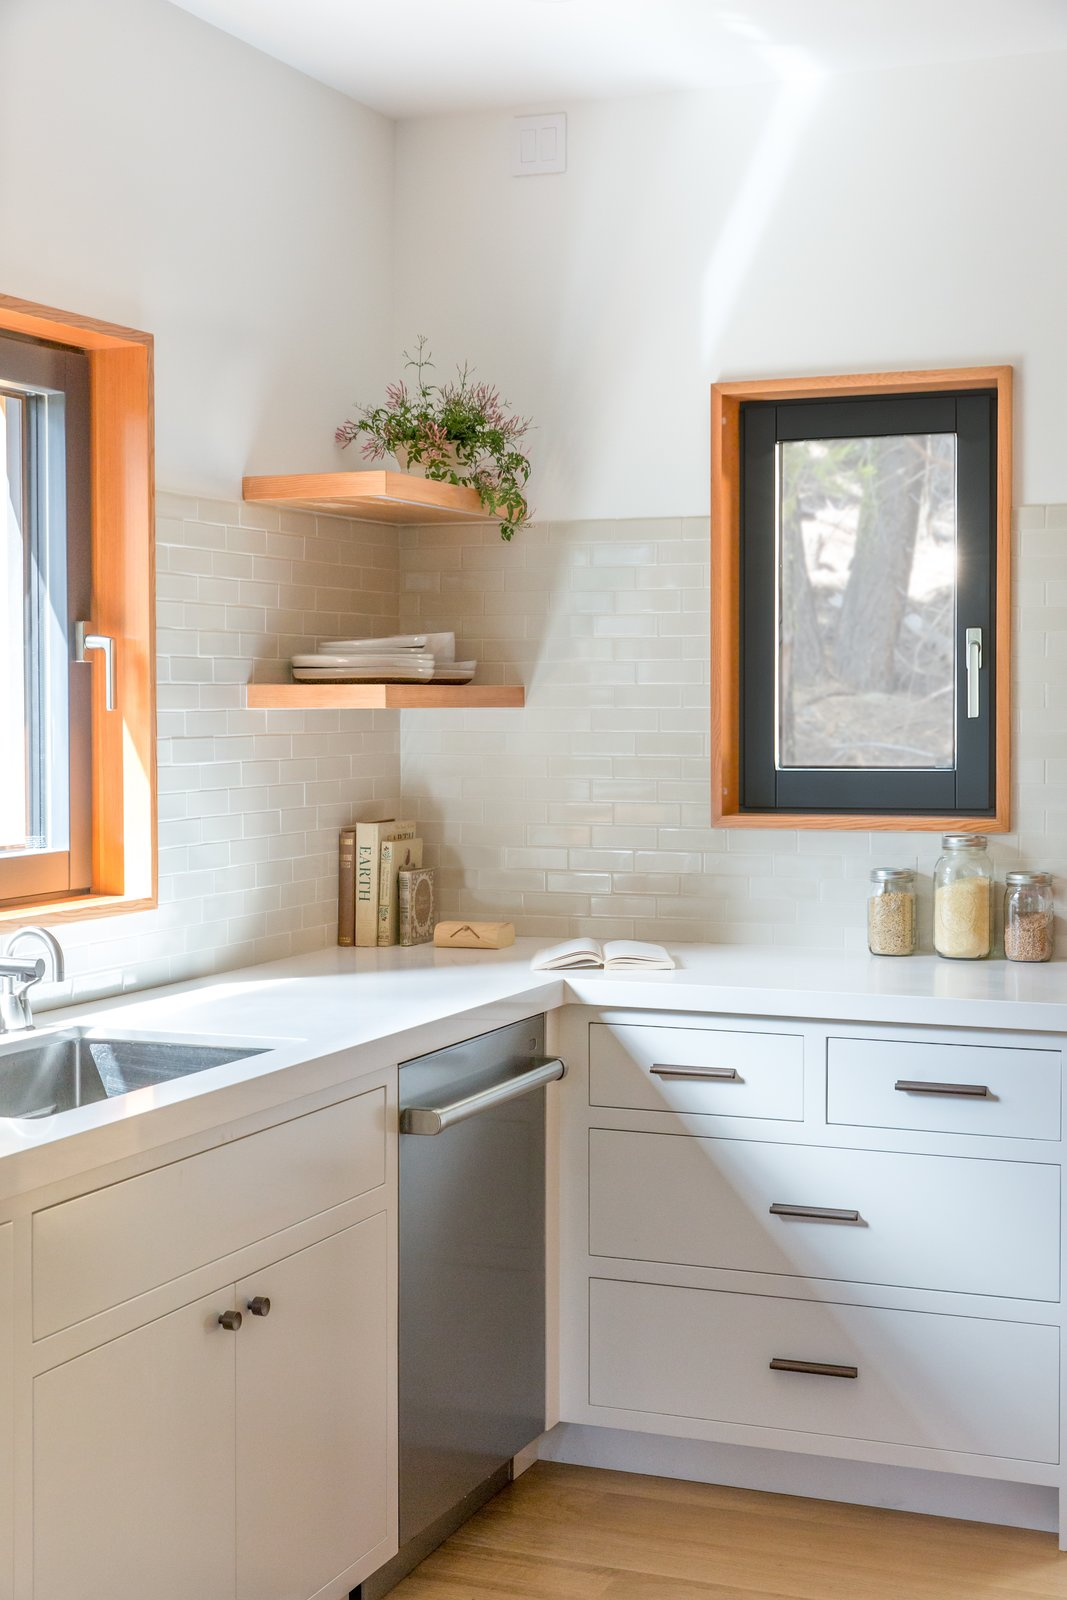 Kitchen, White Cabinet, Ceramic Tile Backsplashe, Light Hardwood Floor, and Undermount Sink  Woodsy Tahoe Cabin by Regan Baker Design